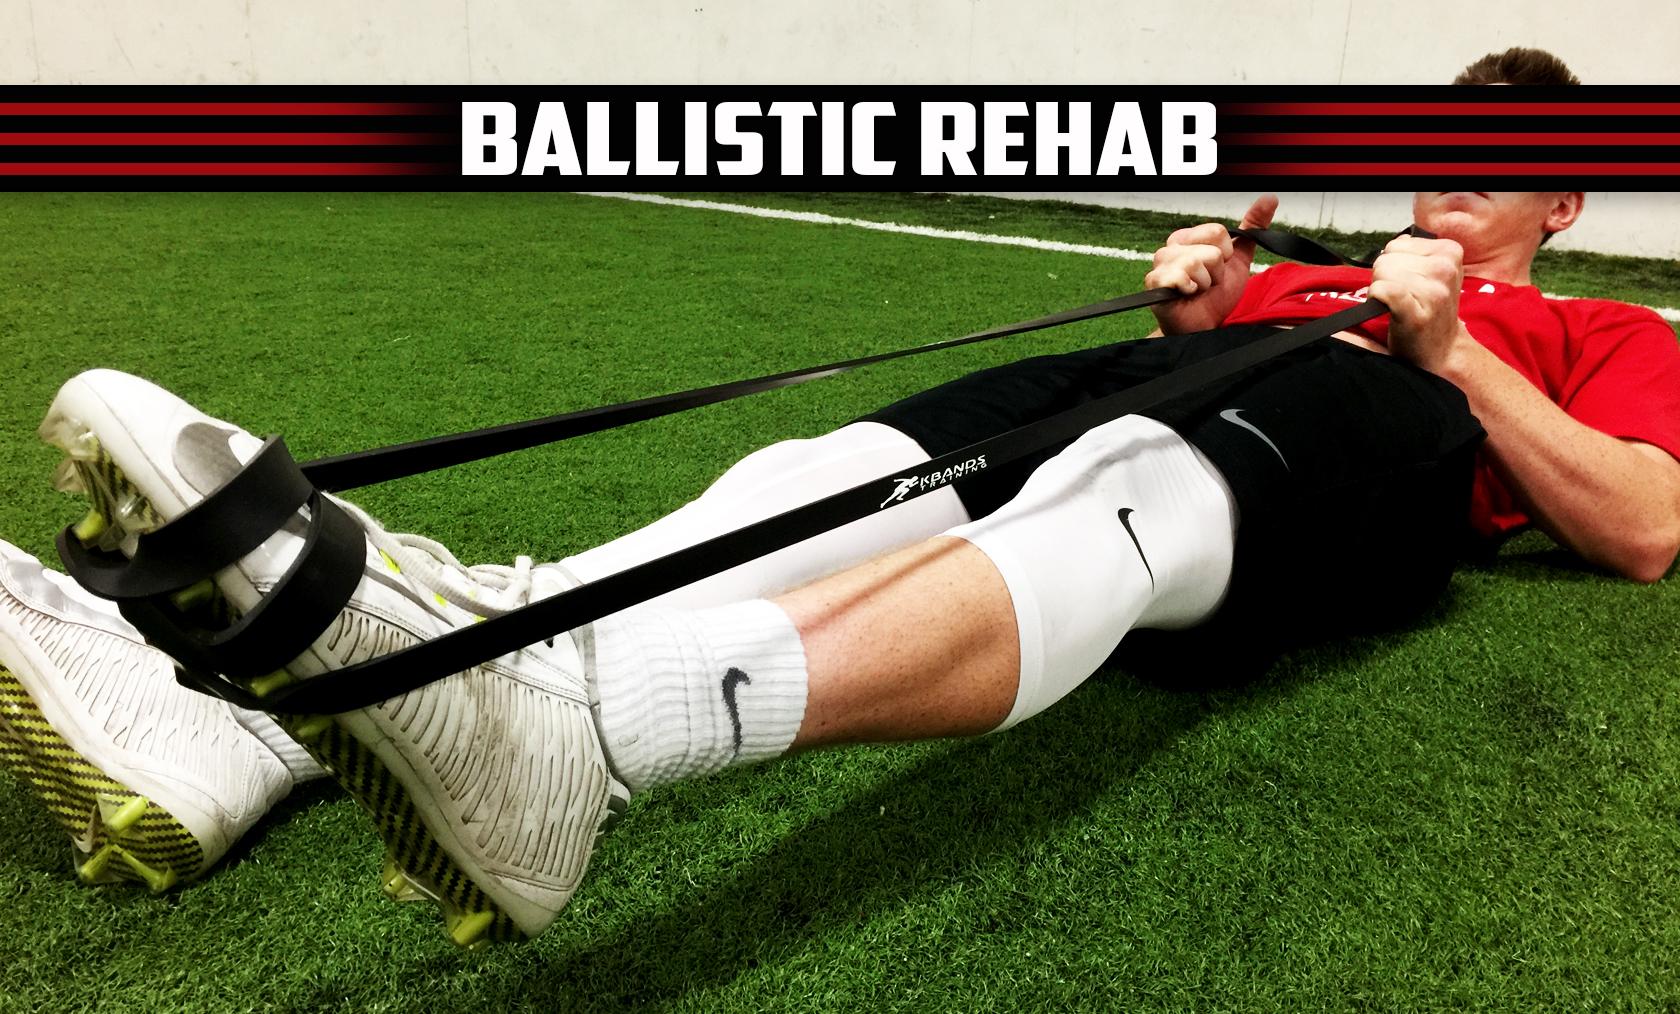 Ballistic Rehab Digital Trainer